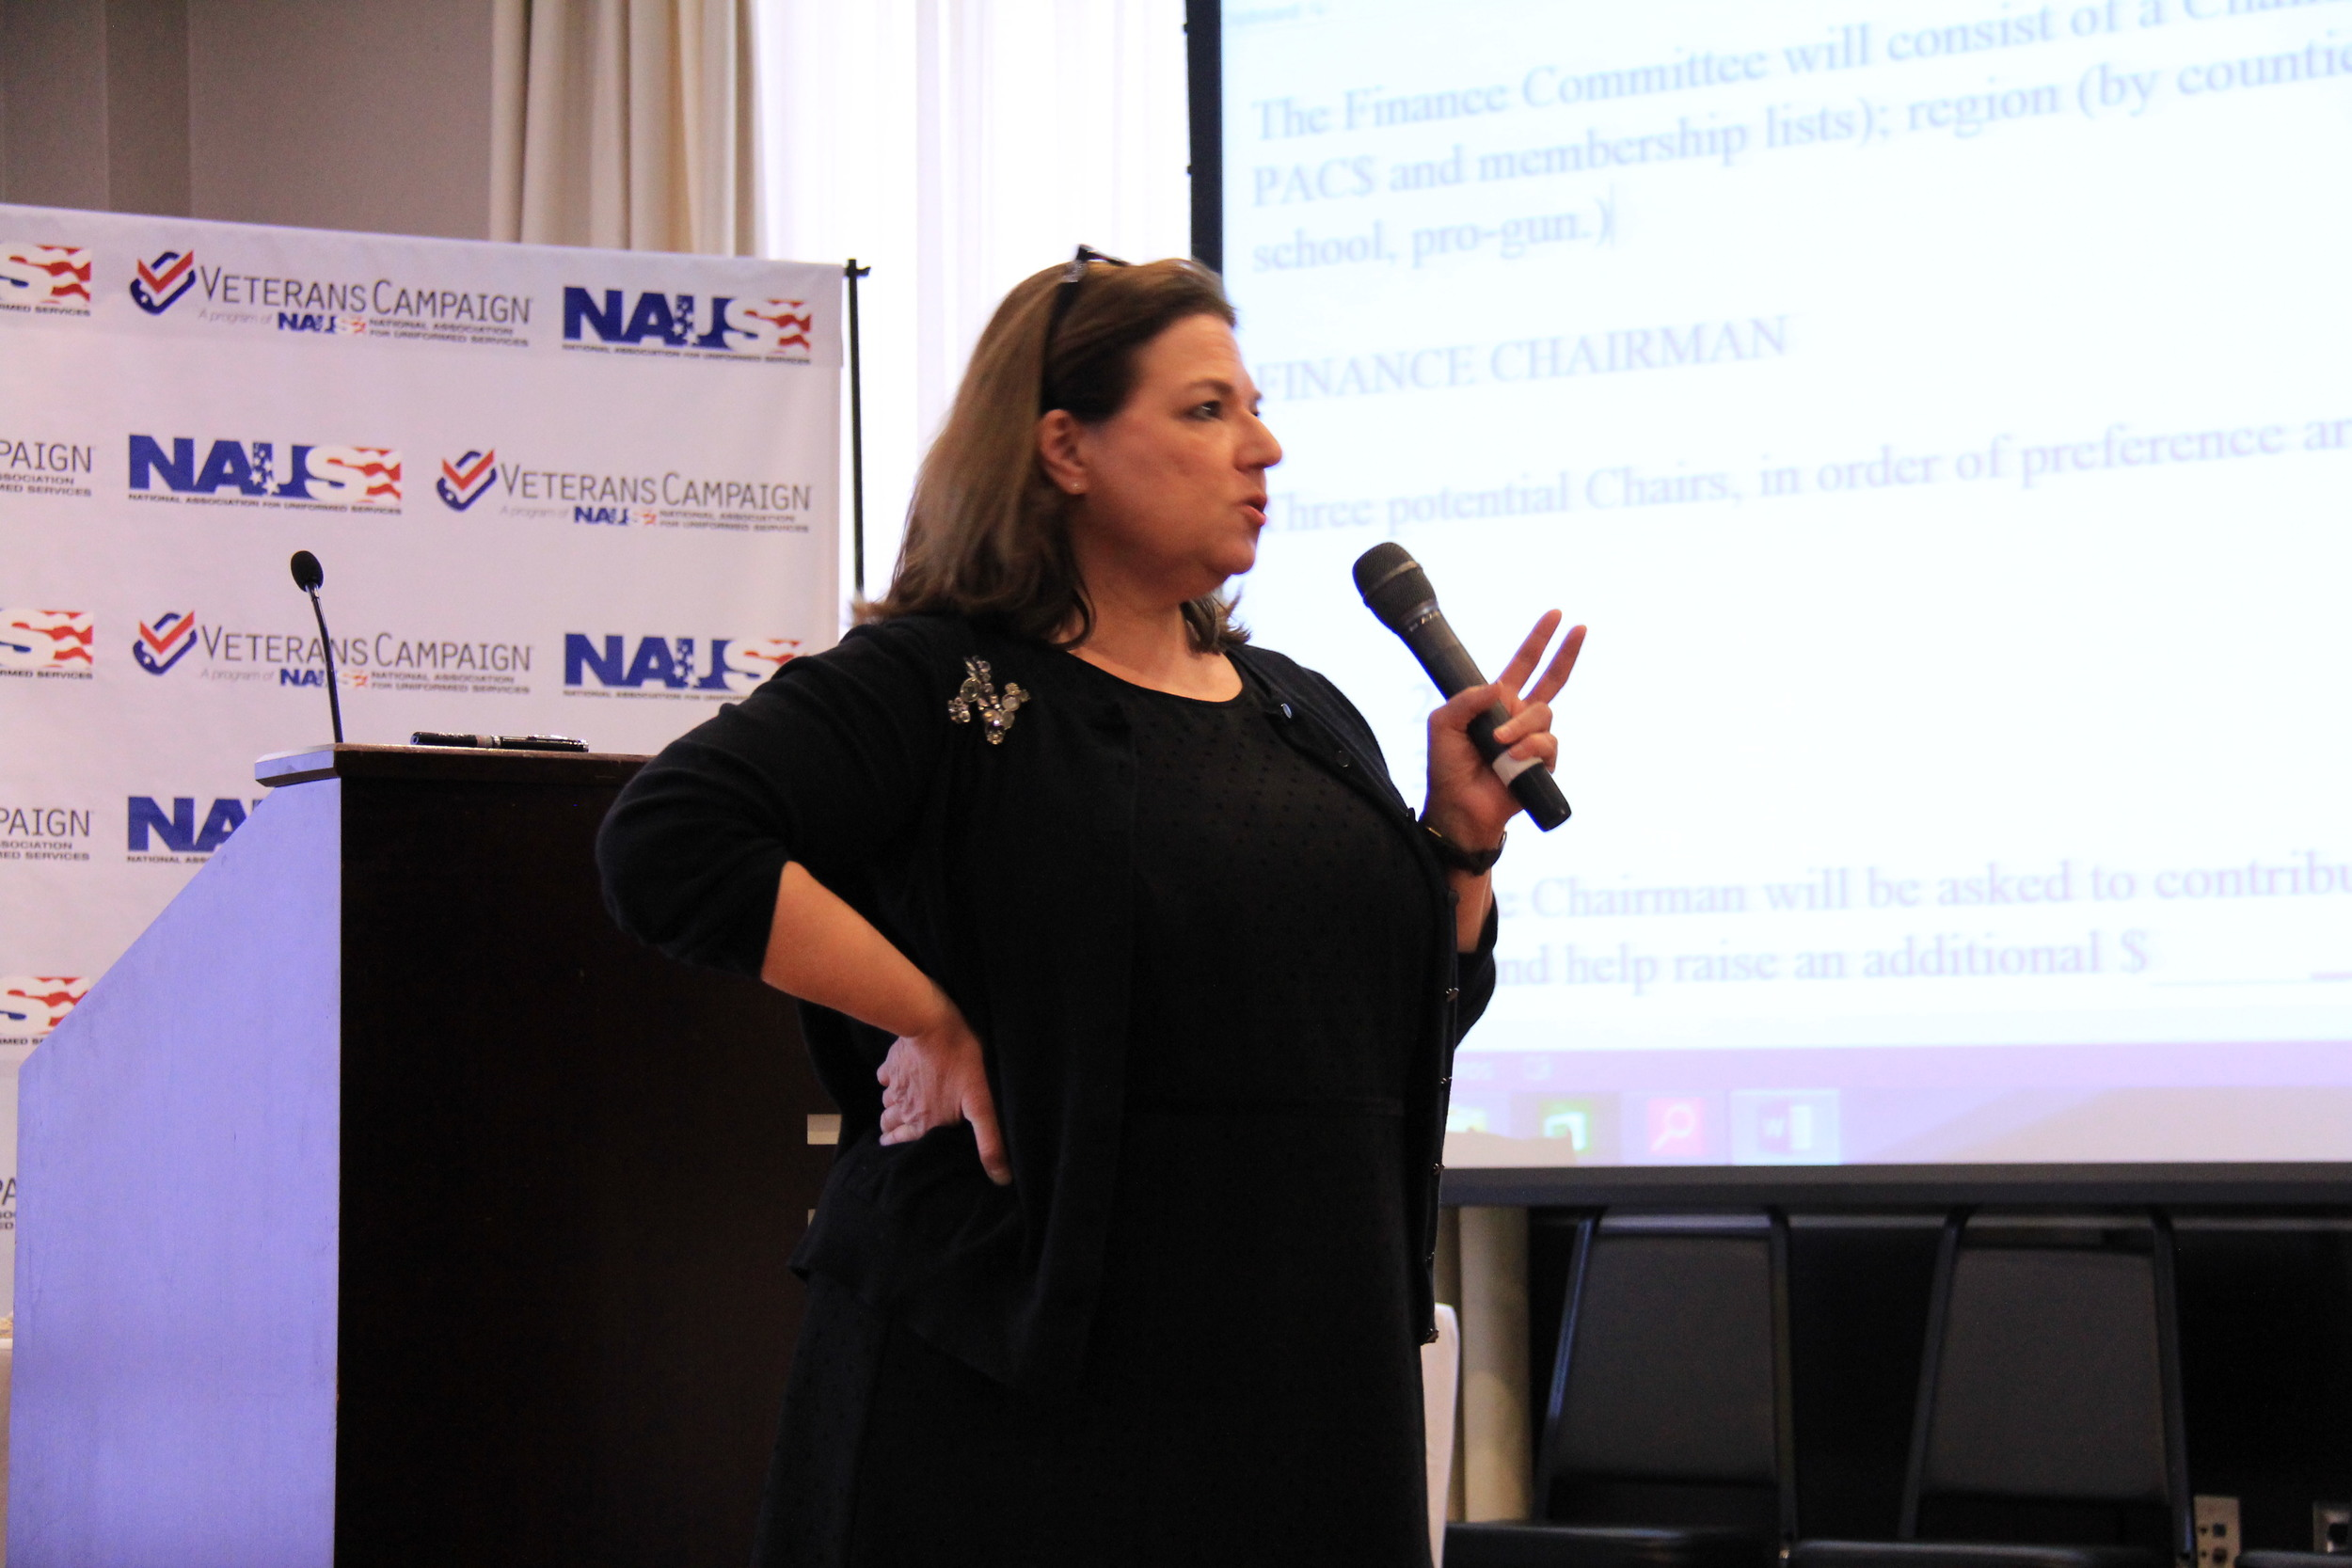 Fundraising expert Nancy Bocskor teaches pitch techniques